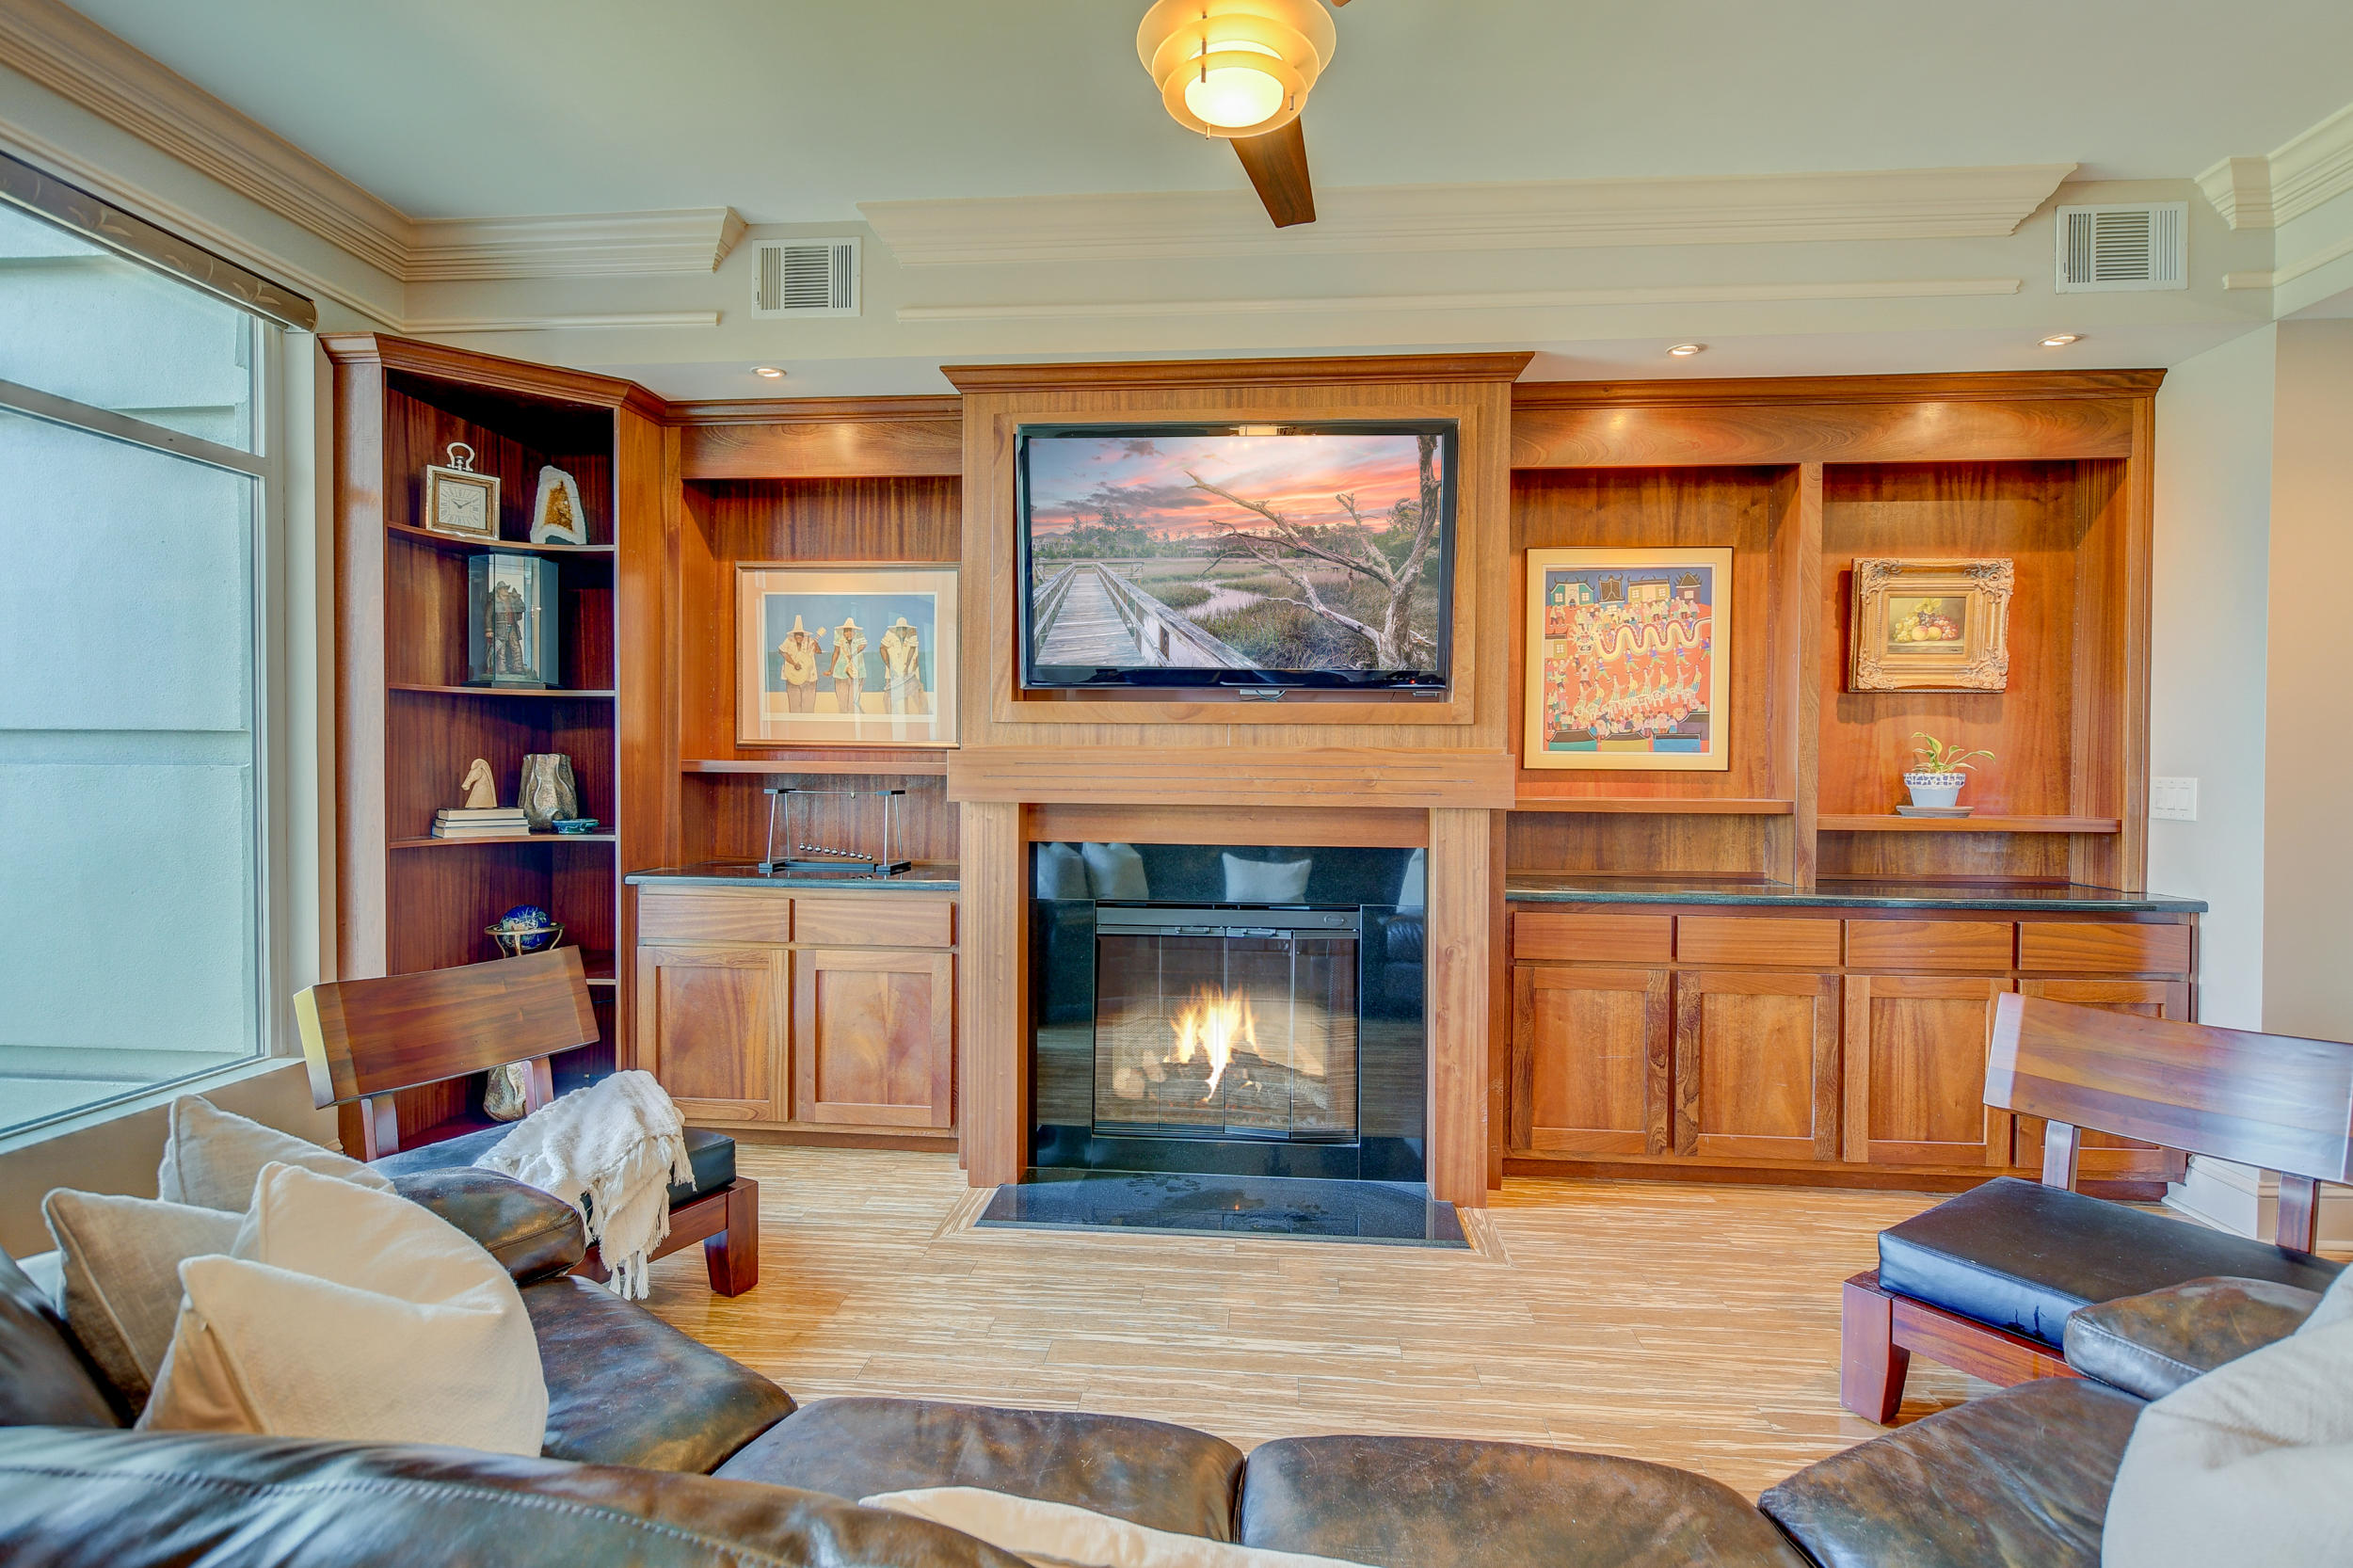 Renaissance On Chas Harbor Homes For Sale - 224 Plaza, Mount Pleasant, SC - 32